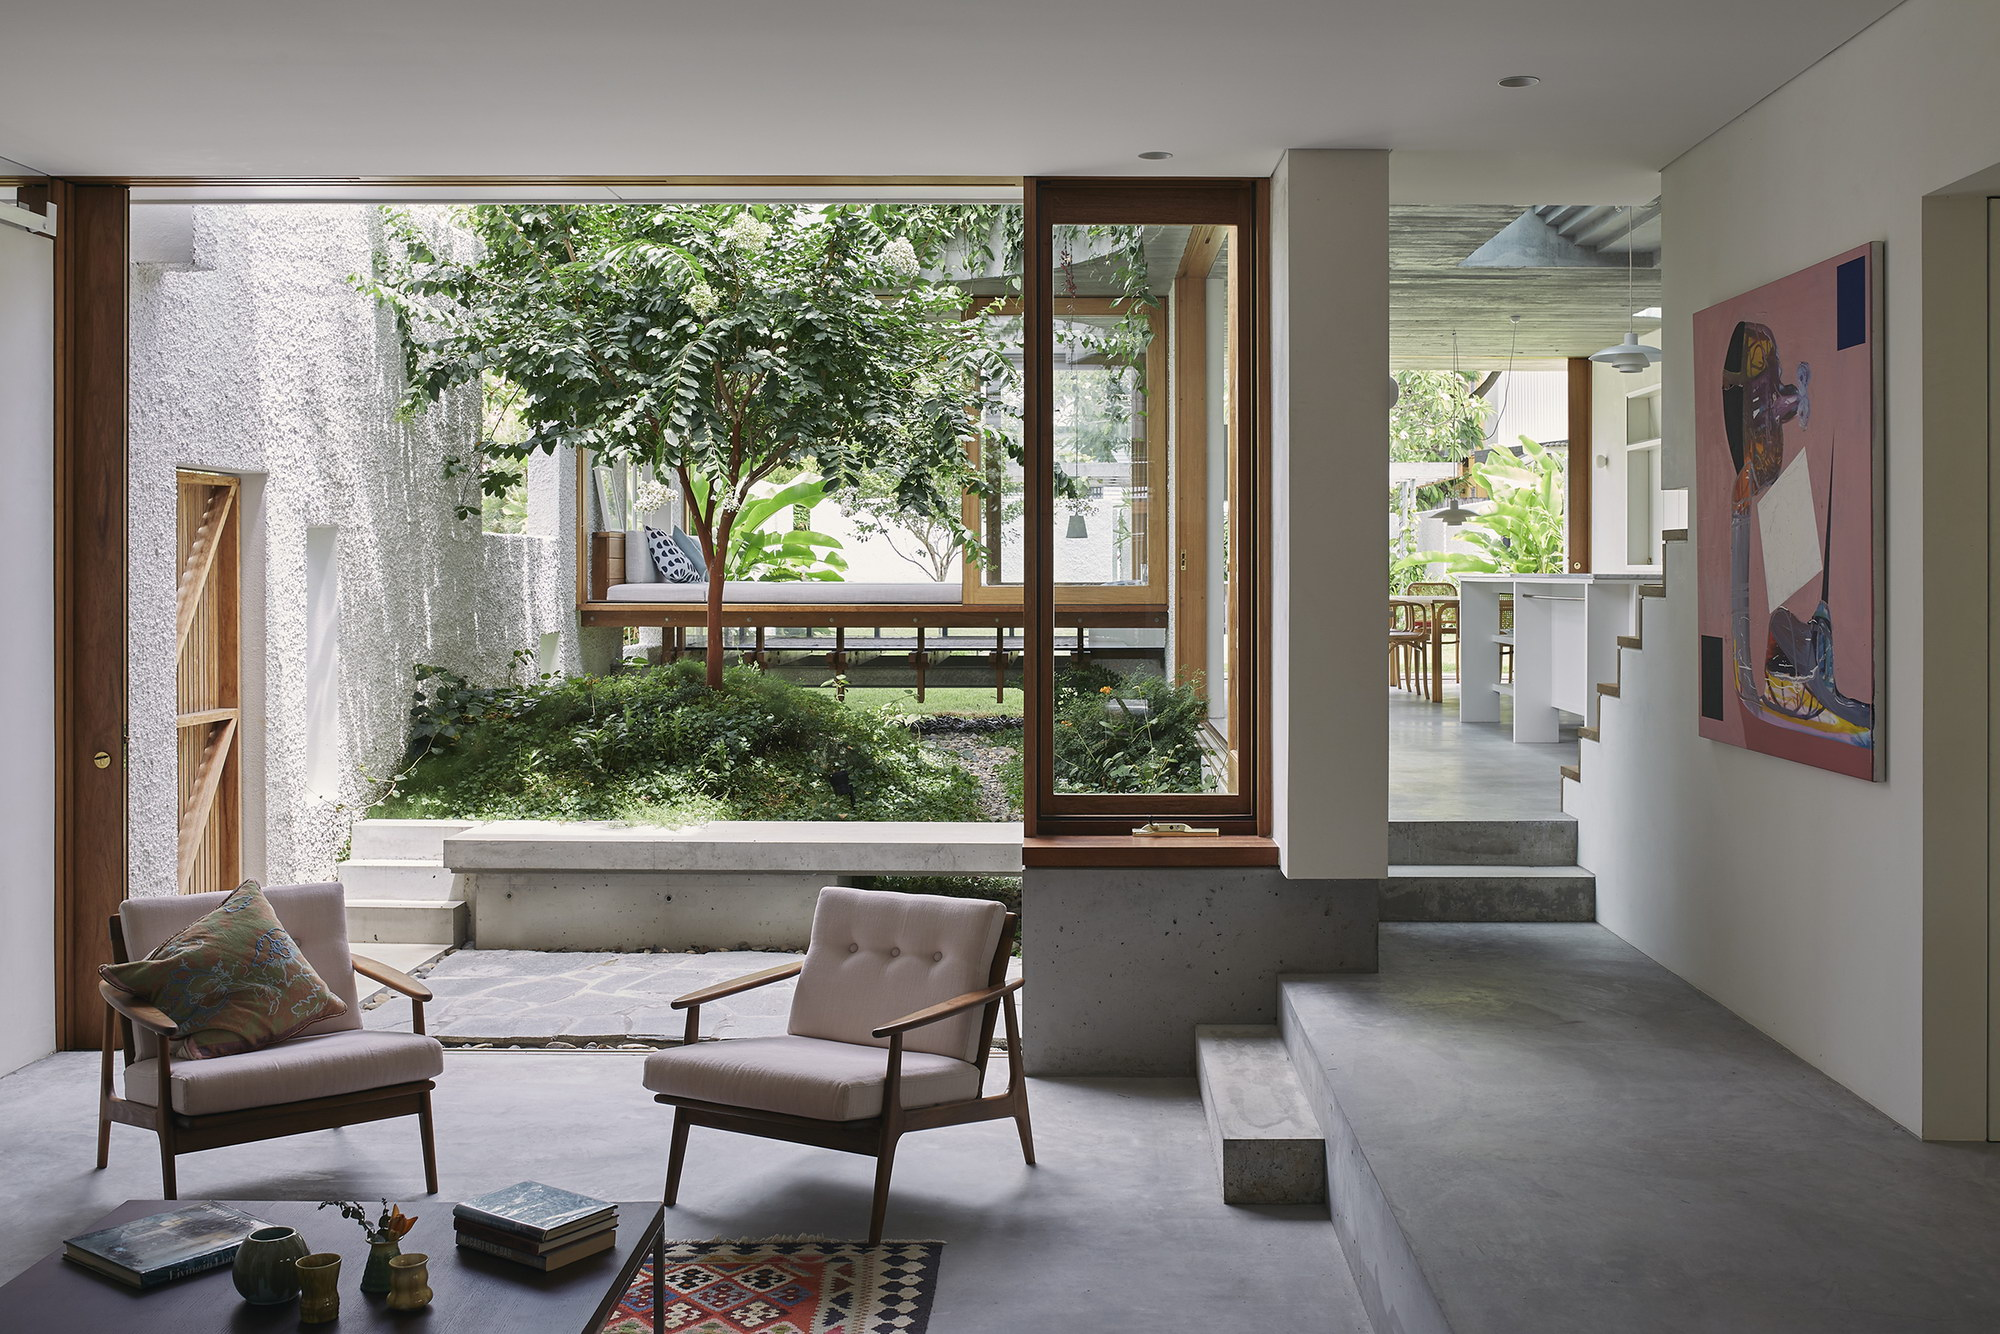 Gibbon Street by Cavill Architects